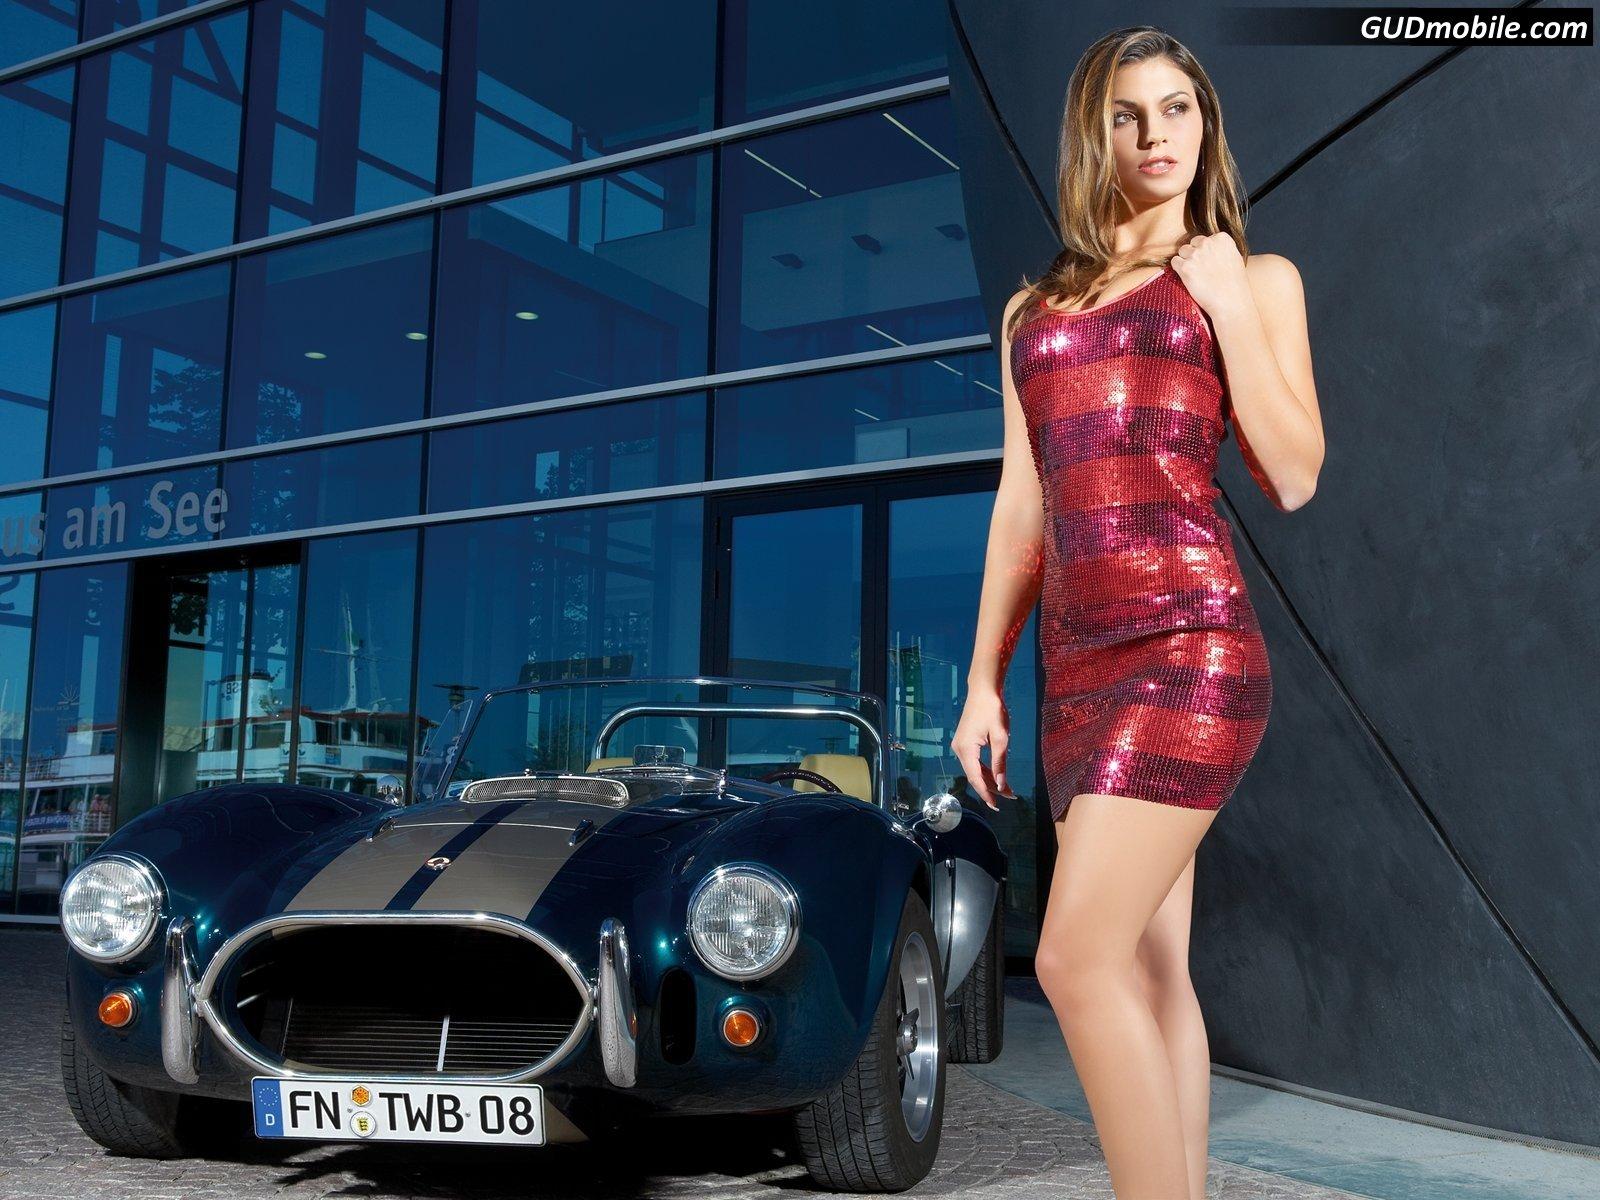 girls and cars pics - photo #2